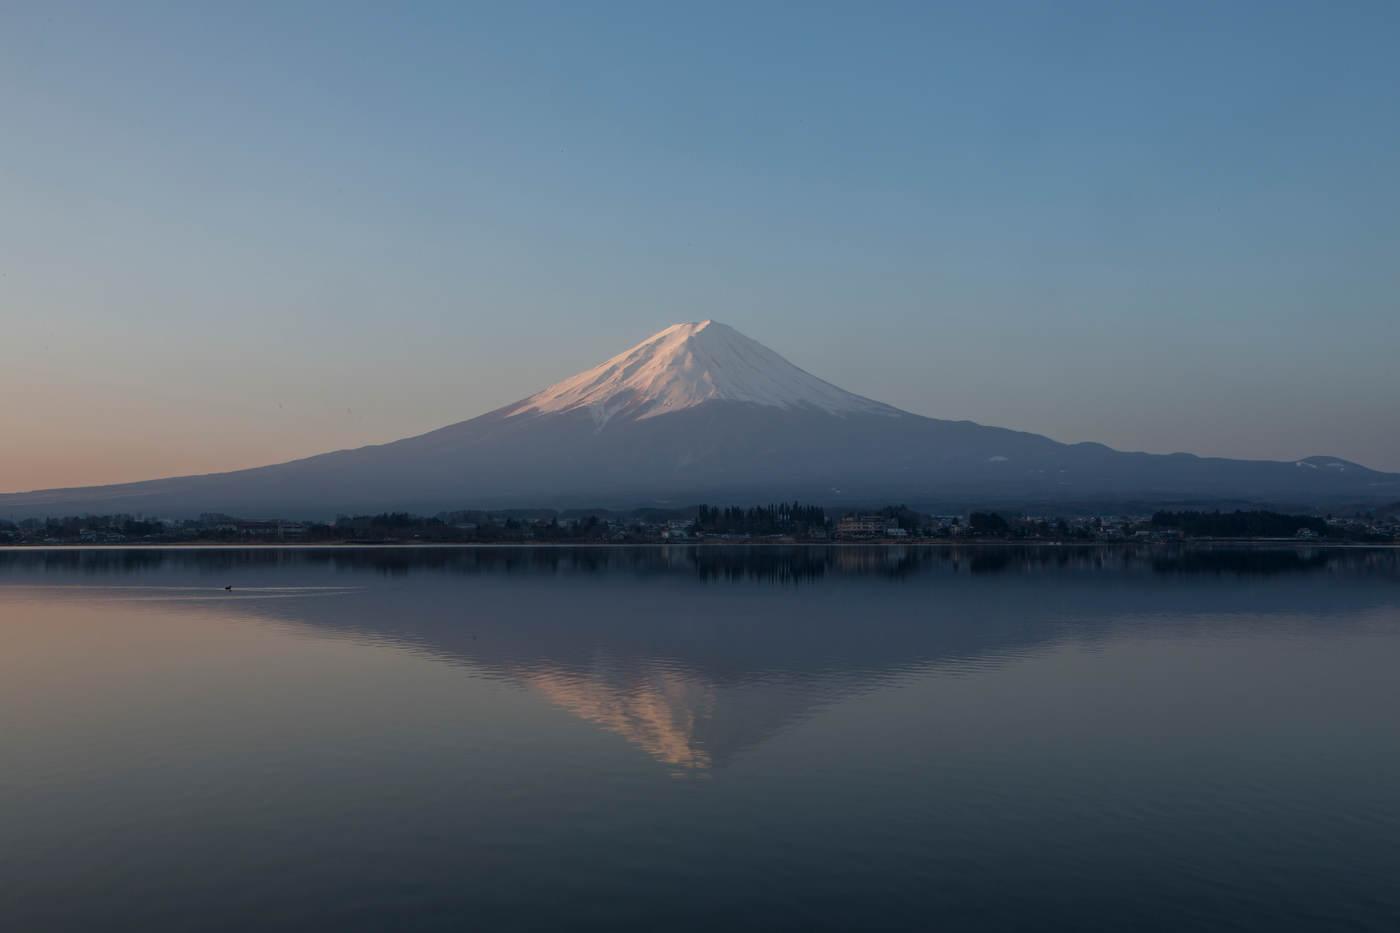 Mt. Fuji reflects in the waters of Lake Kawaguchiko at sunrise.